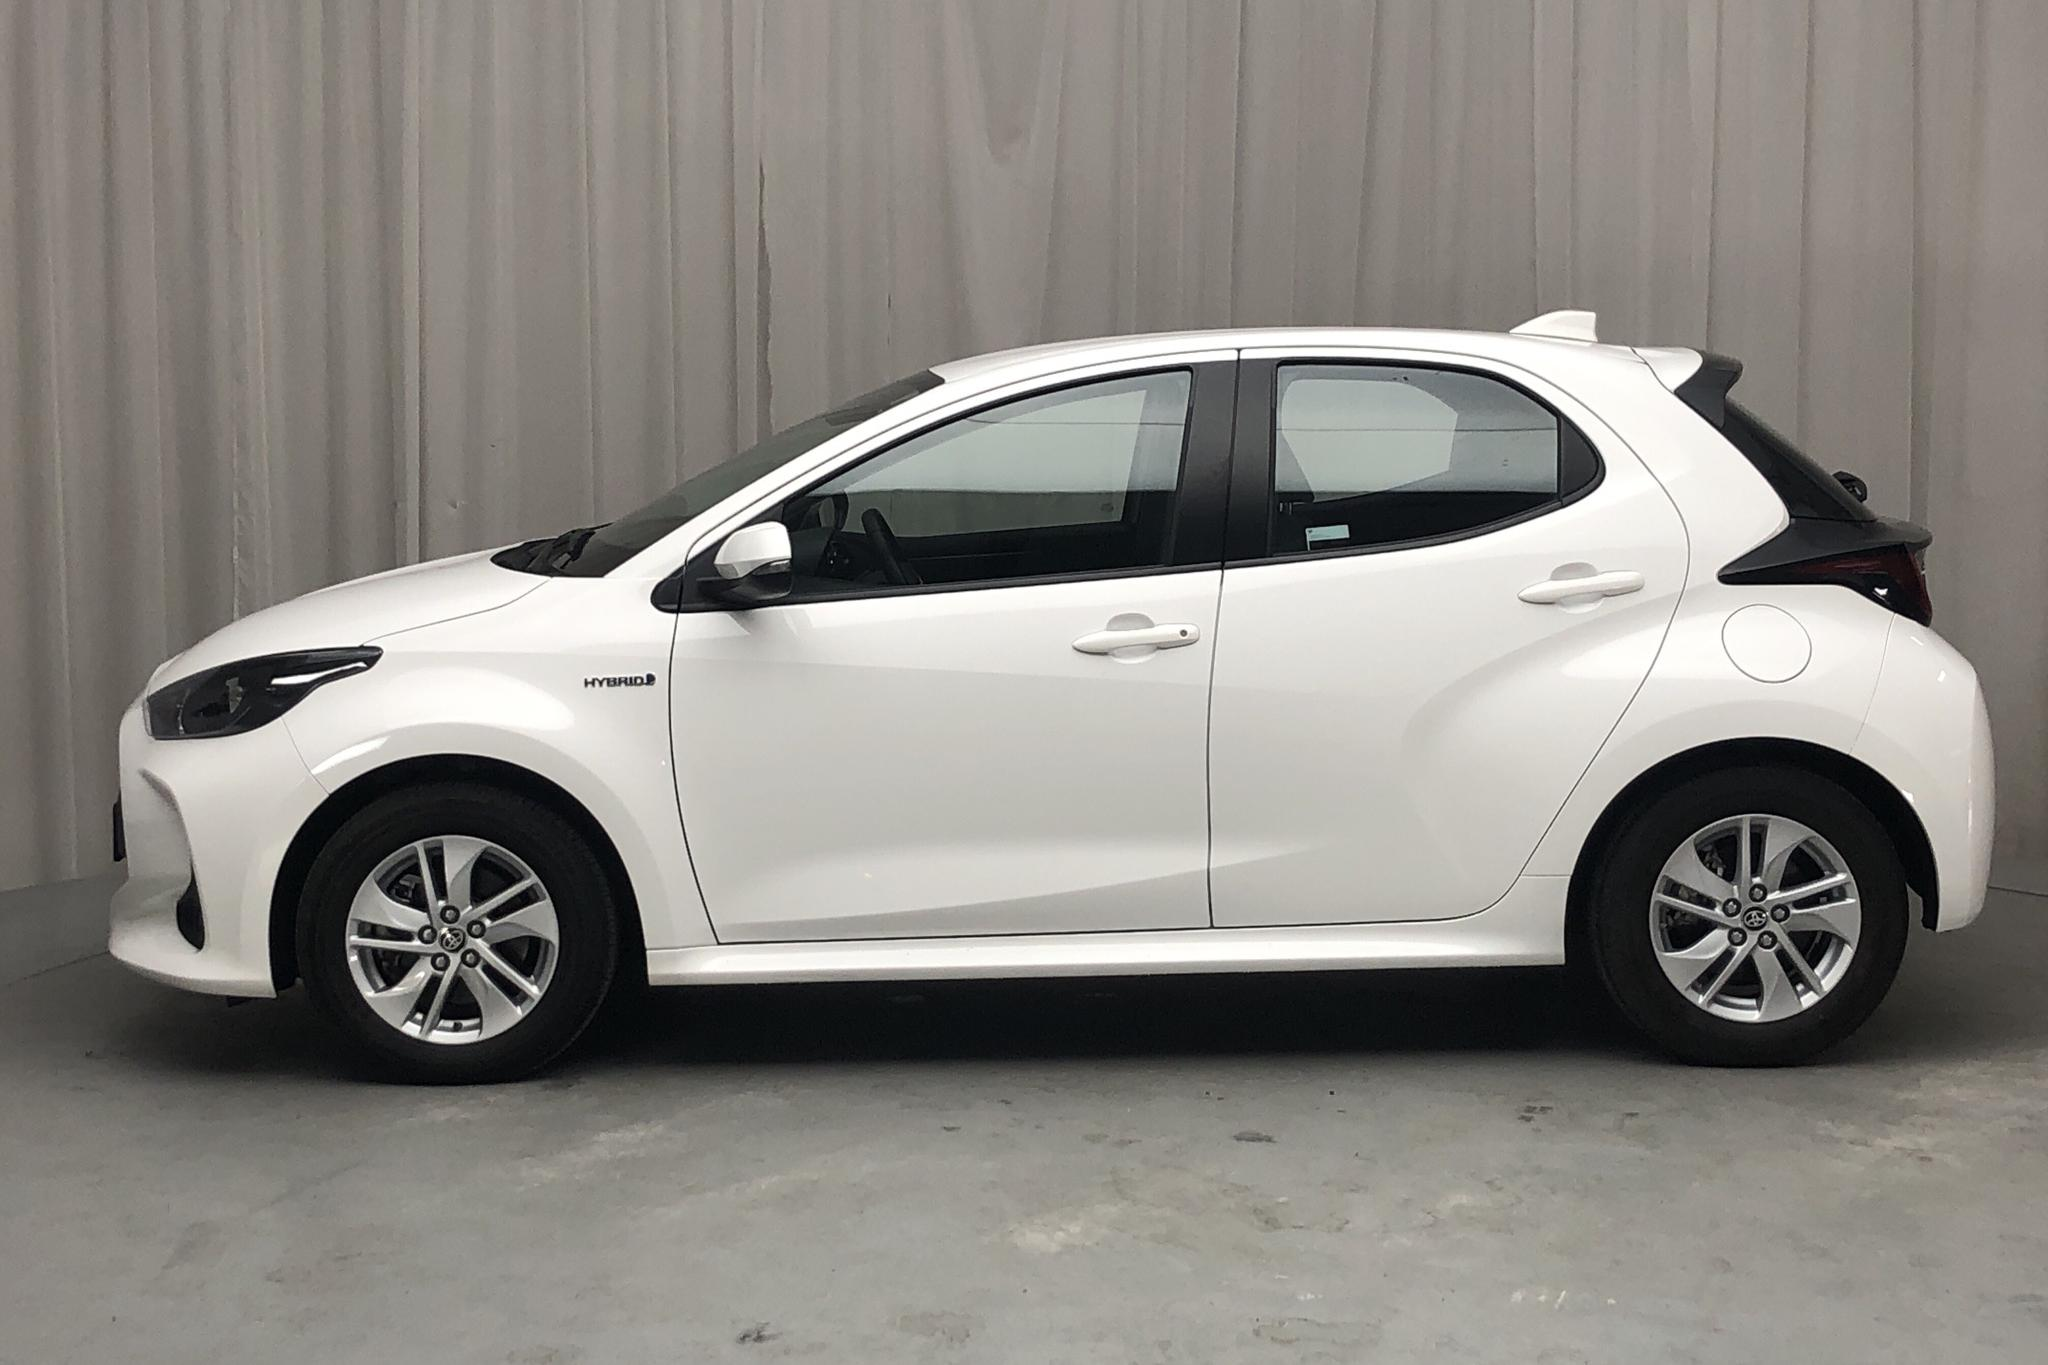 Toyota Yaris 1.5 Hybrid - 3 970 km - Automatic - white - 2021